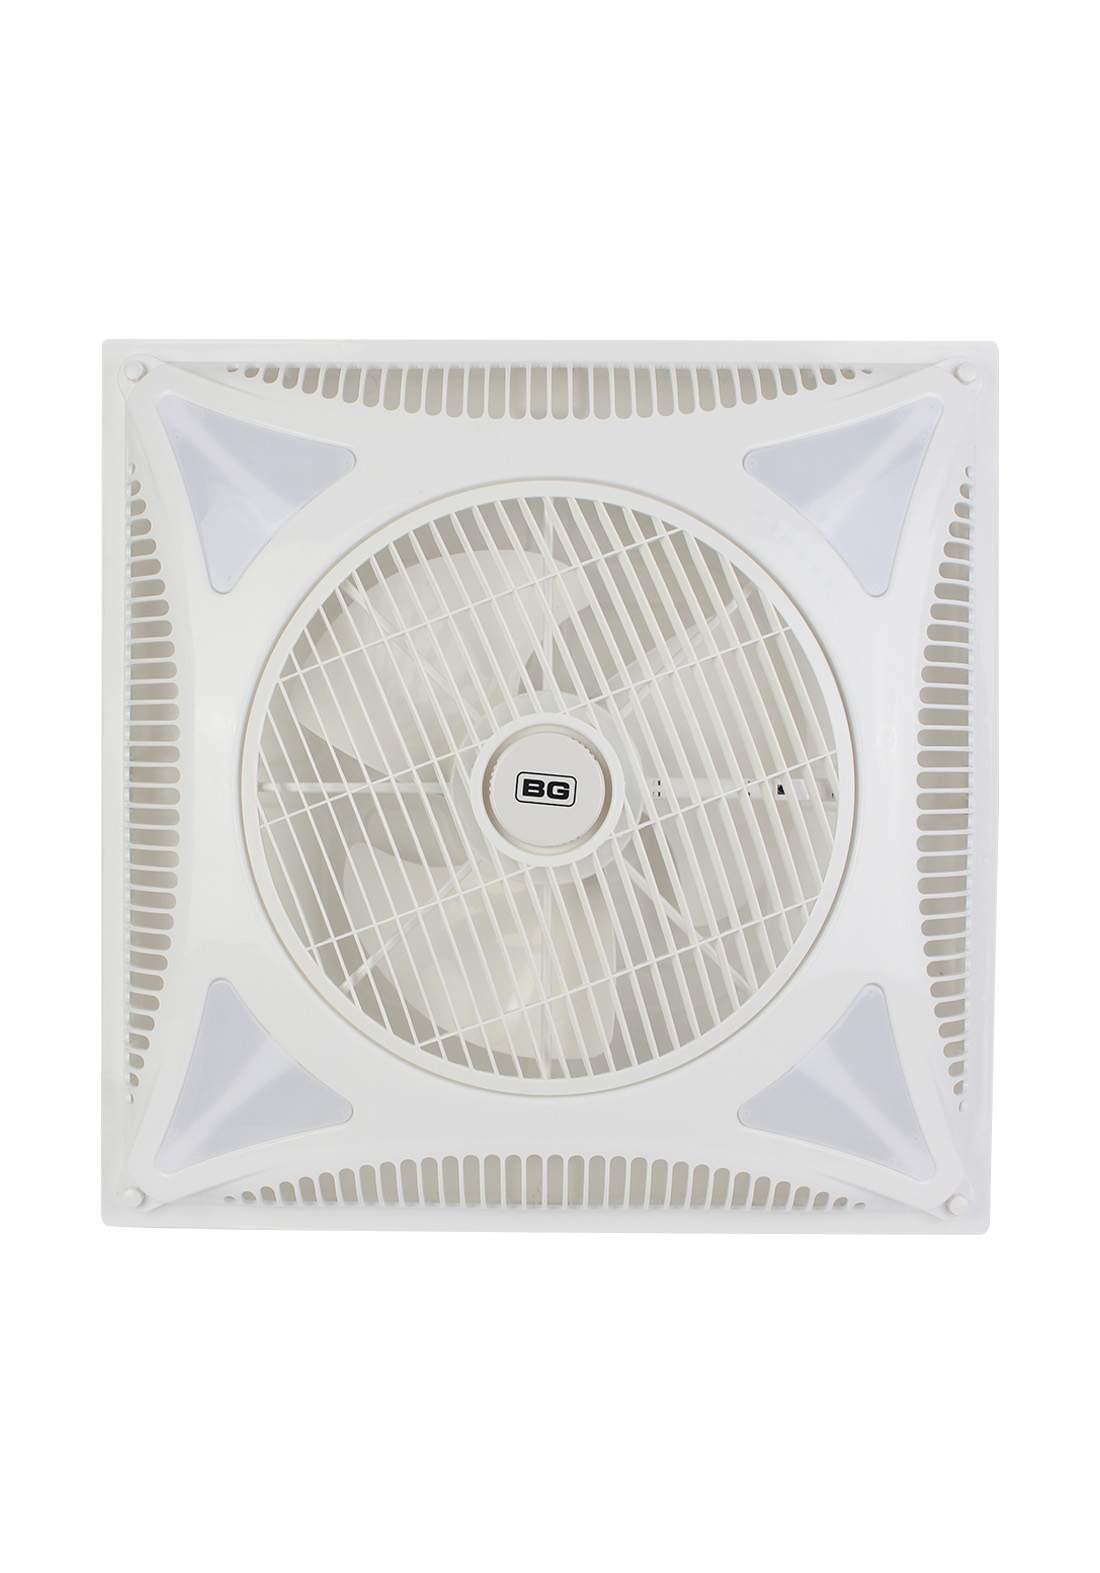 Bg BCF66S Ceiling Fan 14 inch مروحة سقف ظاهرية